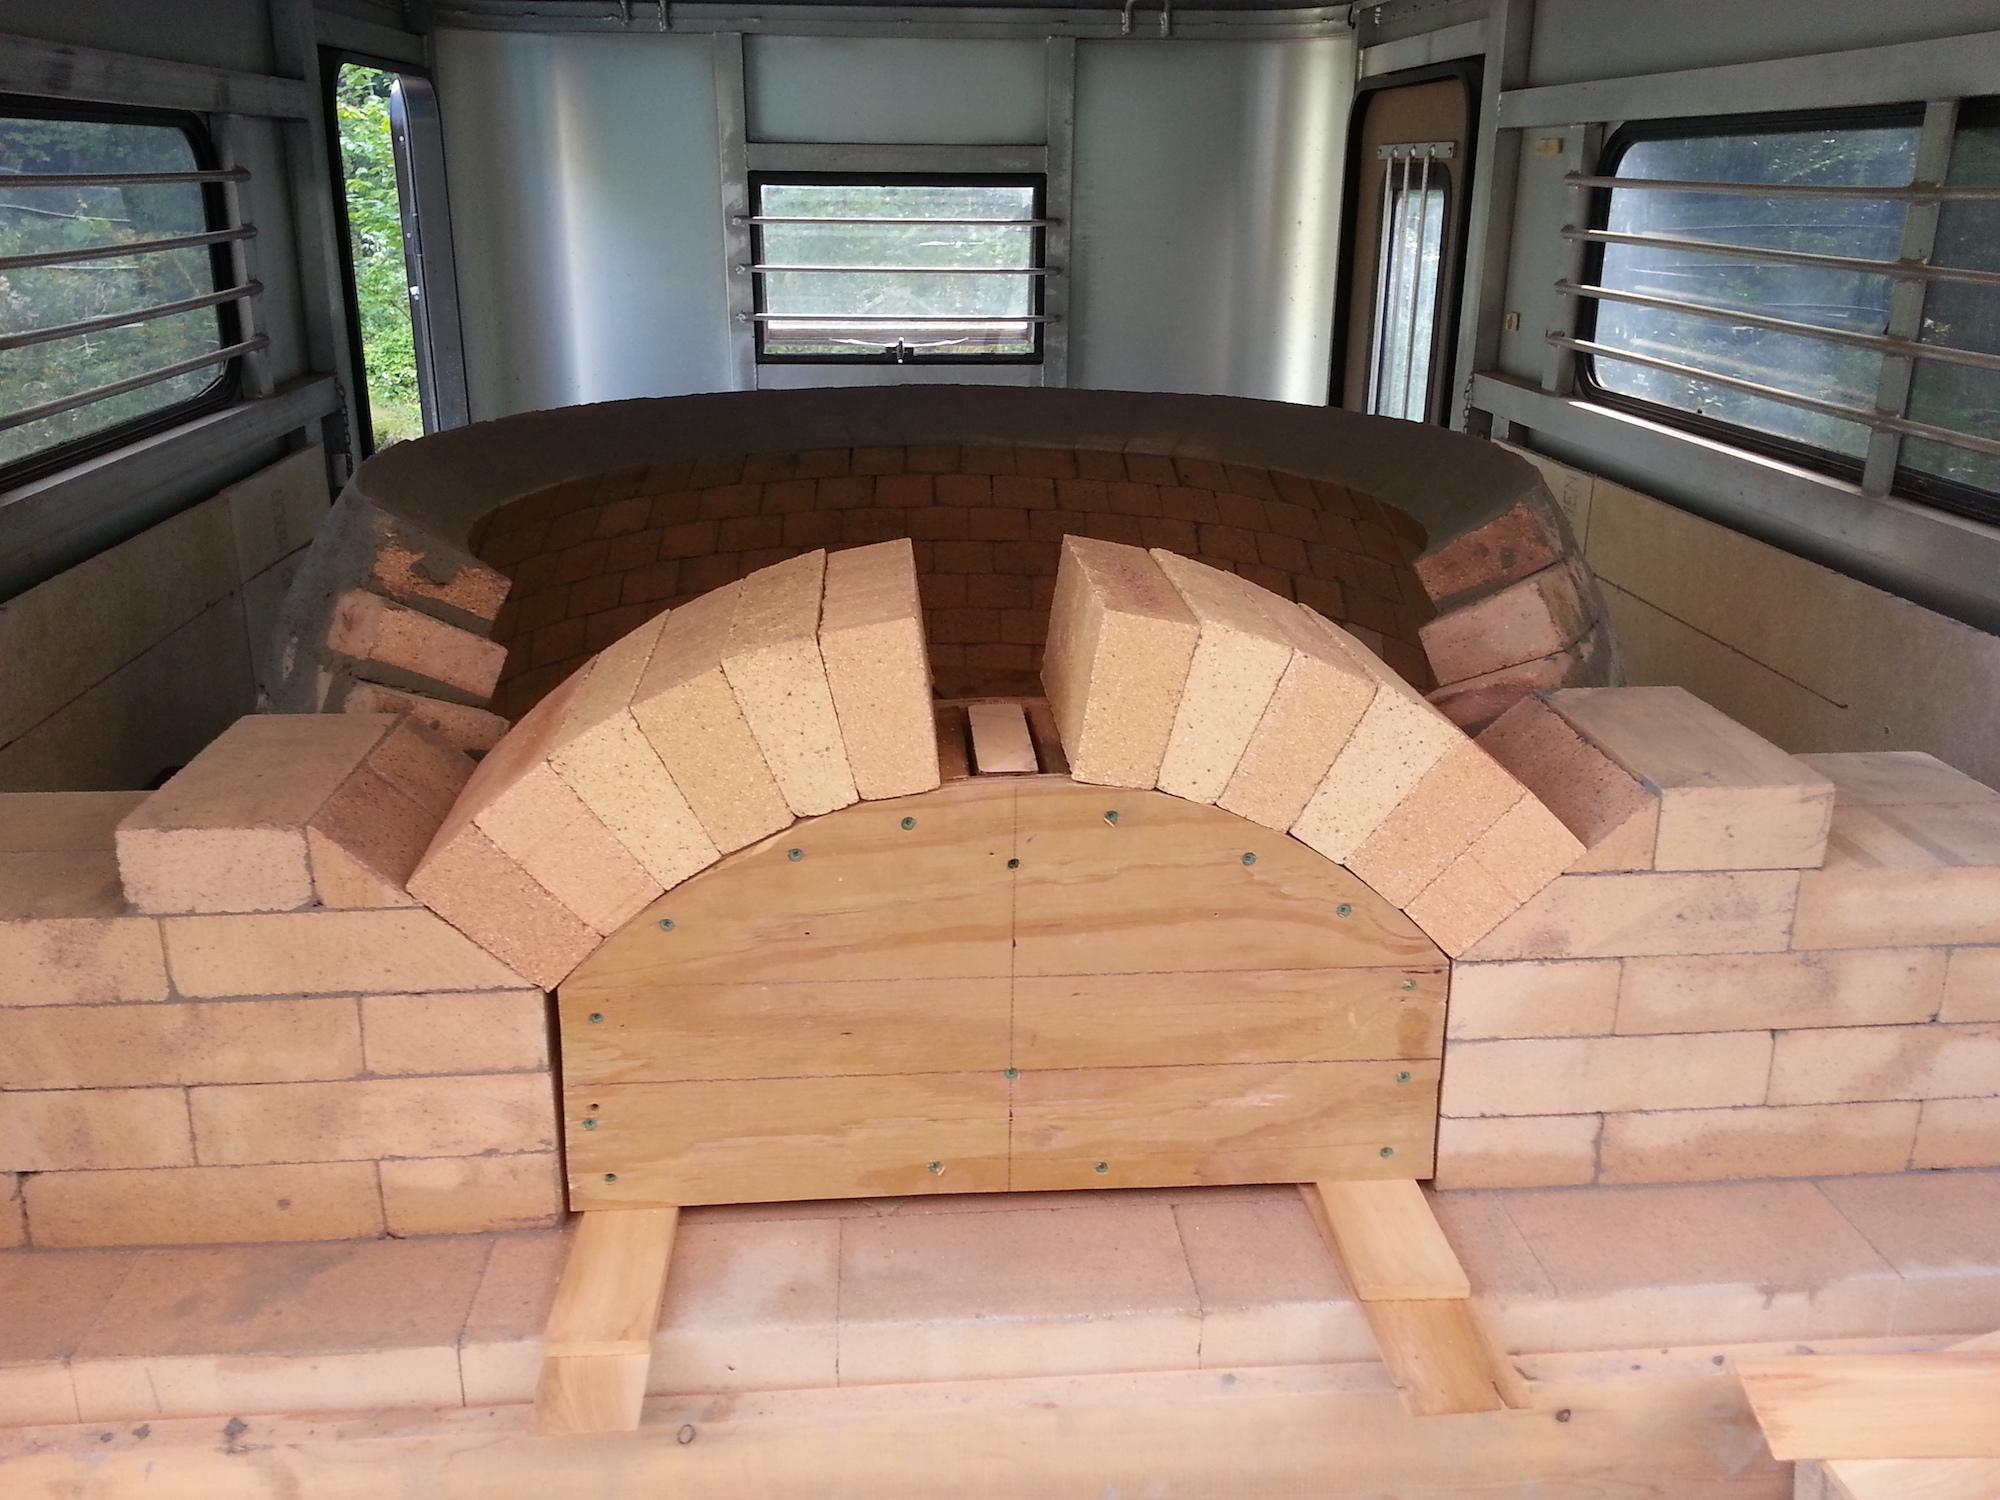 An oven in progress.